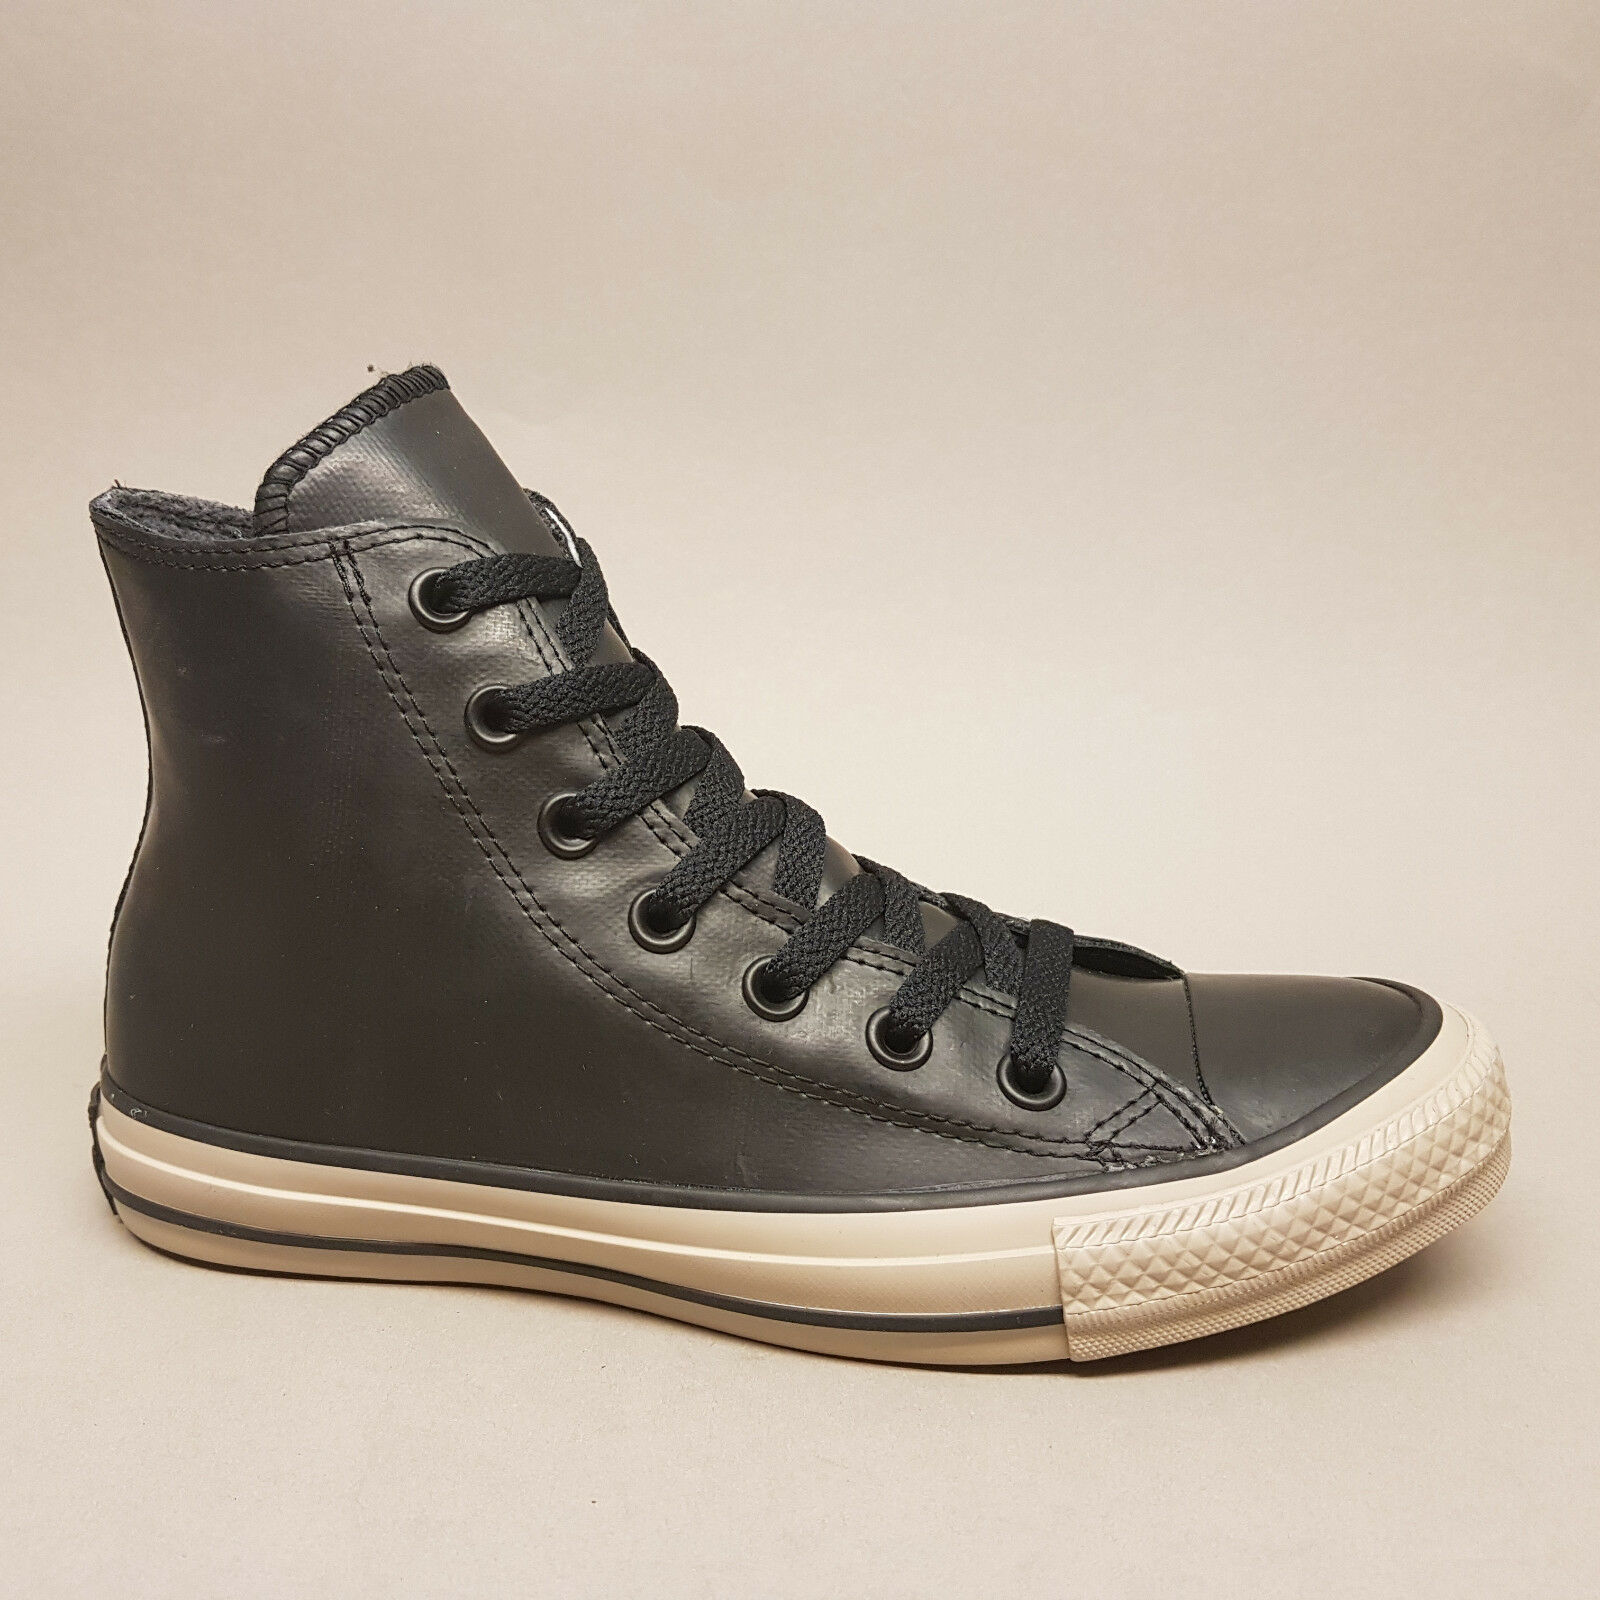 Converse All Star Chuck Hi Black Papyrus 149458C Sneaker Turnschuhe schwarz grau